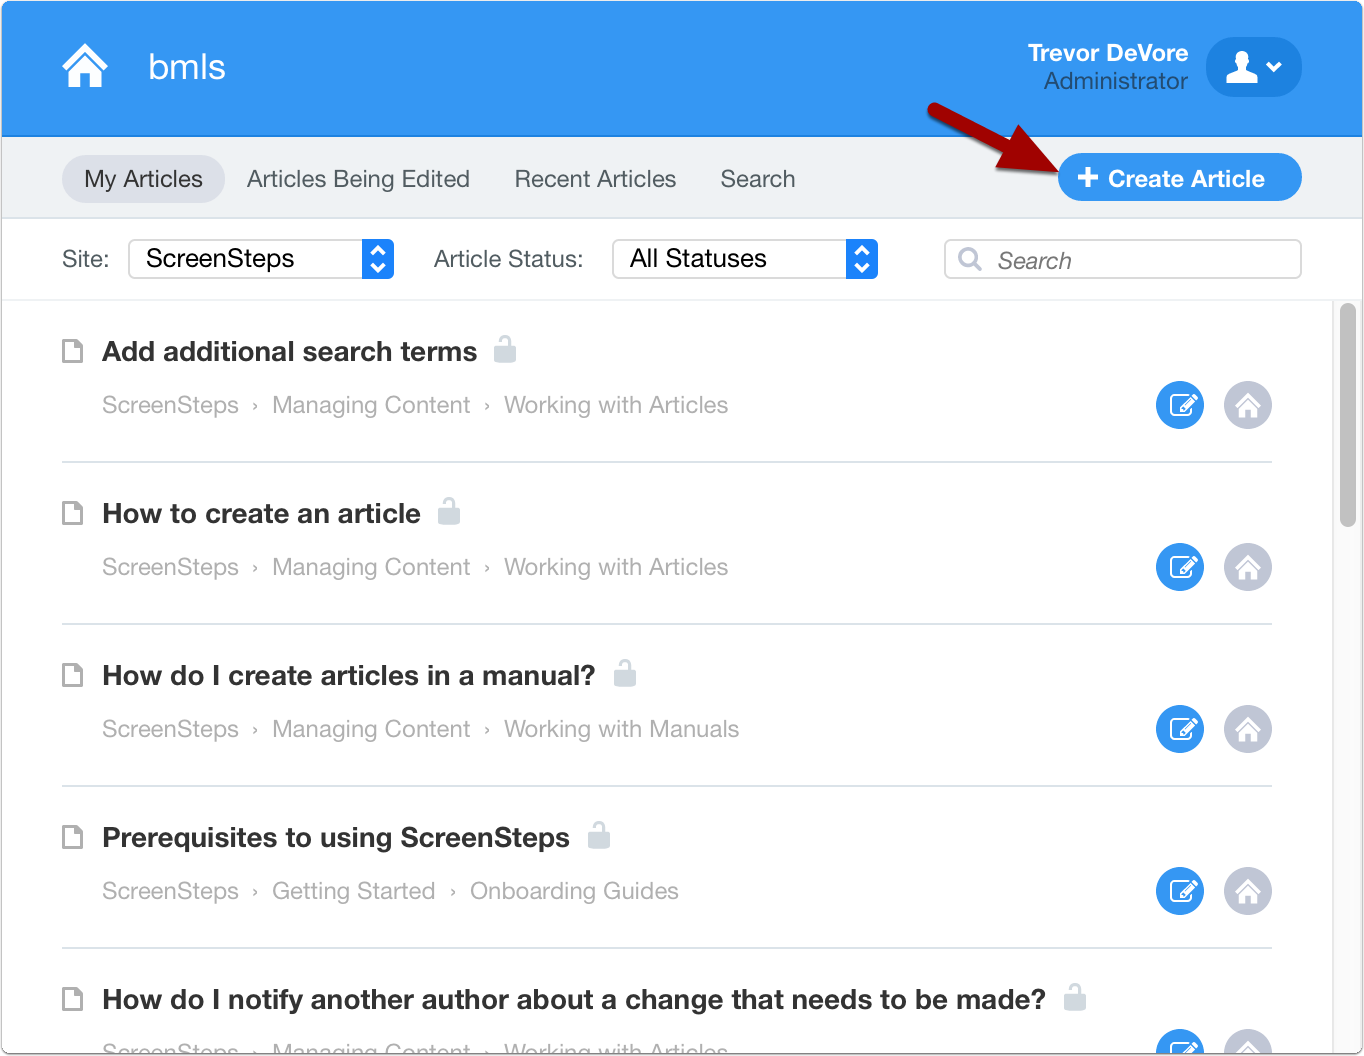 click create article